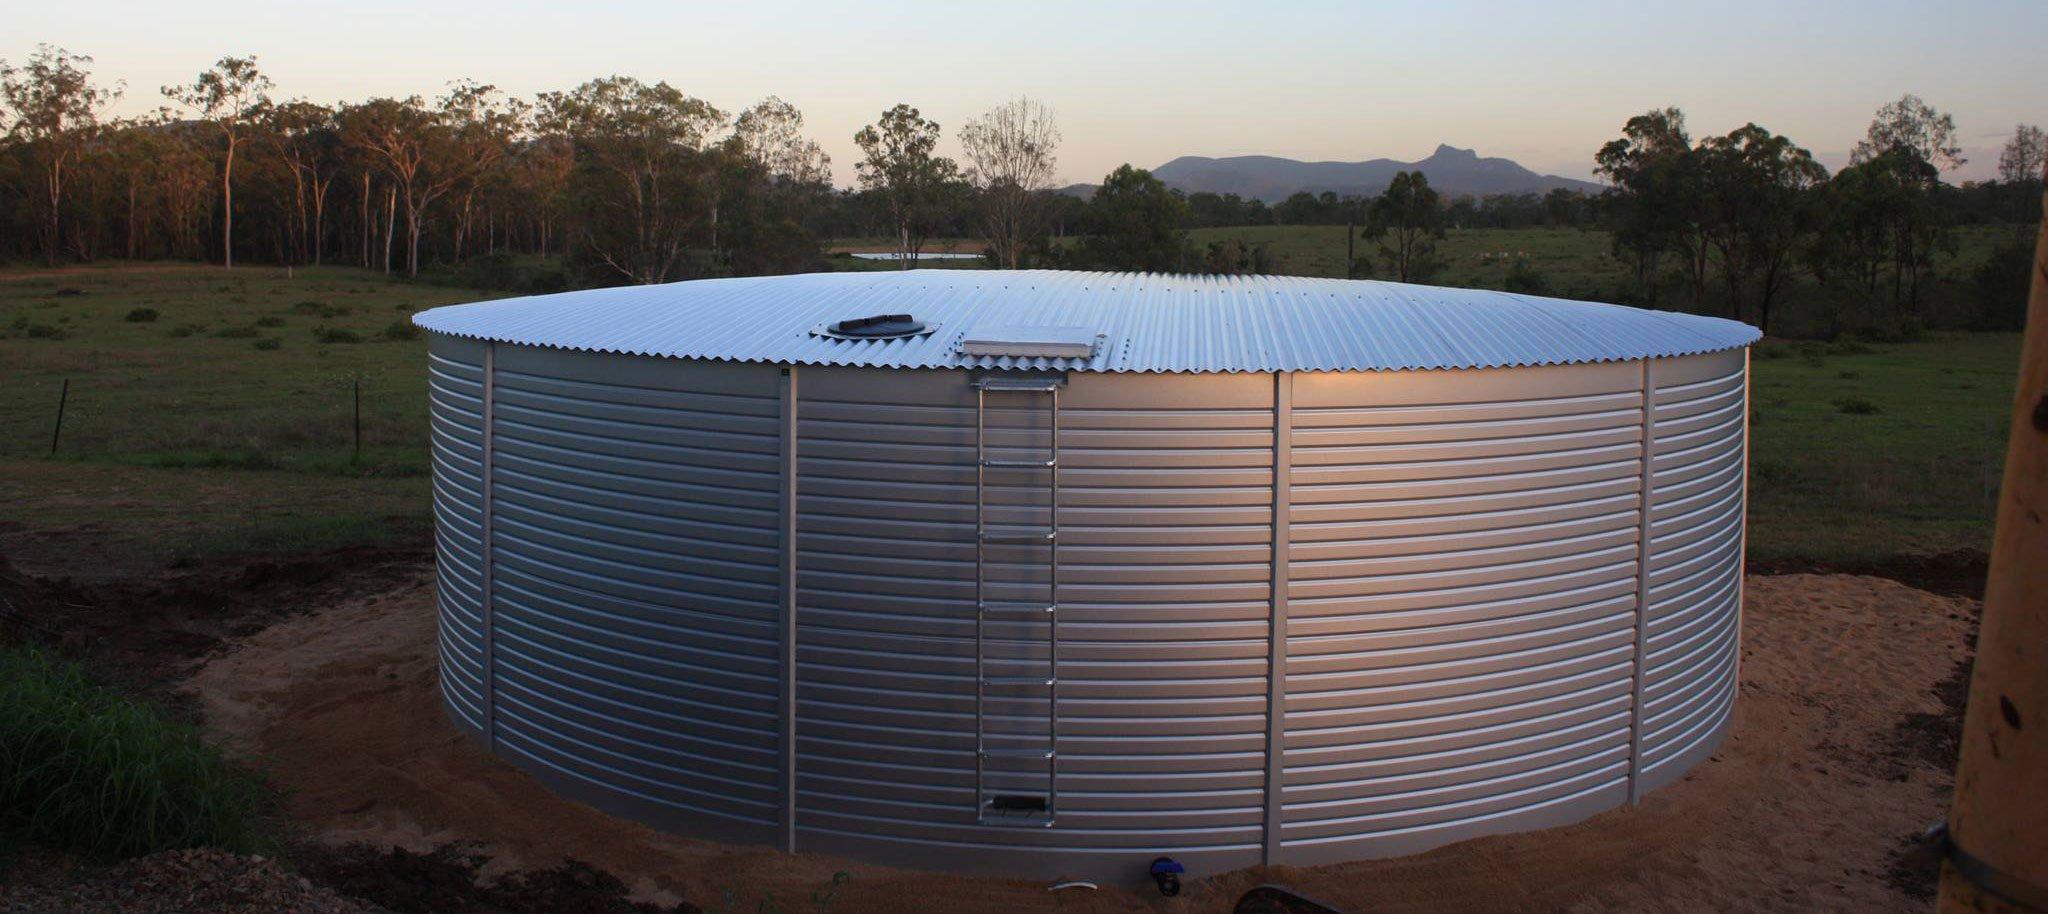 California water storage tanks for sale